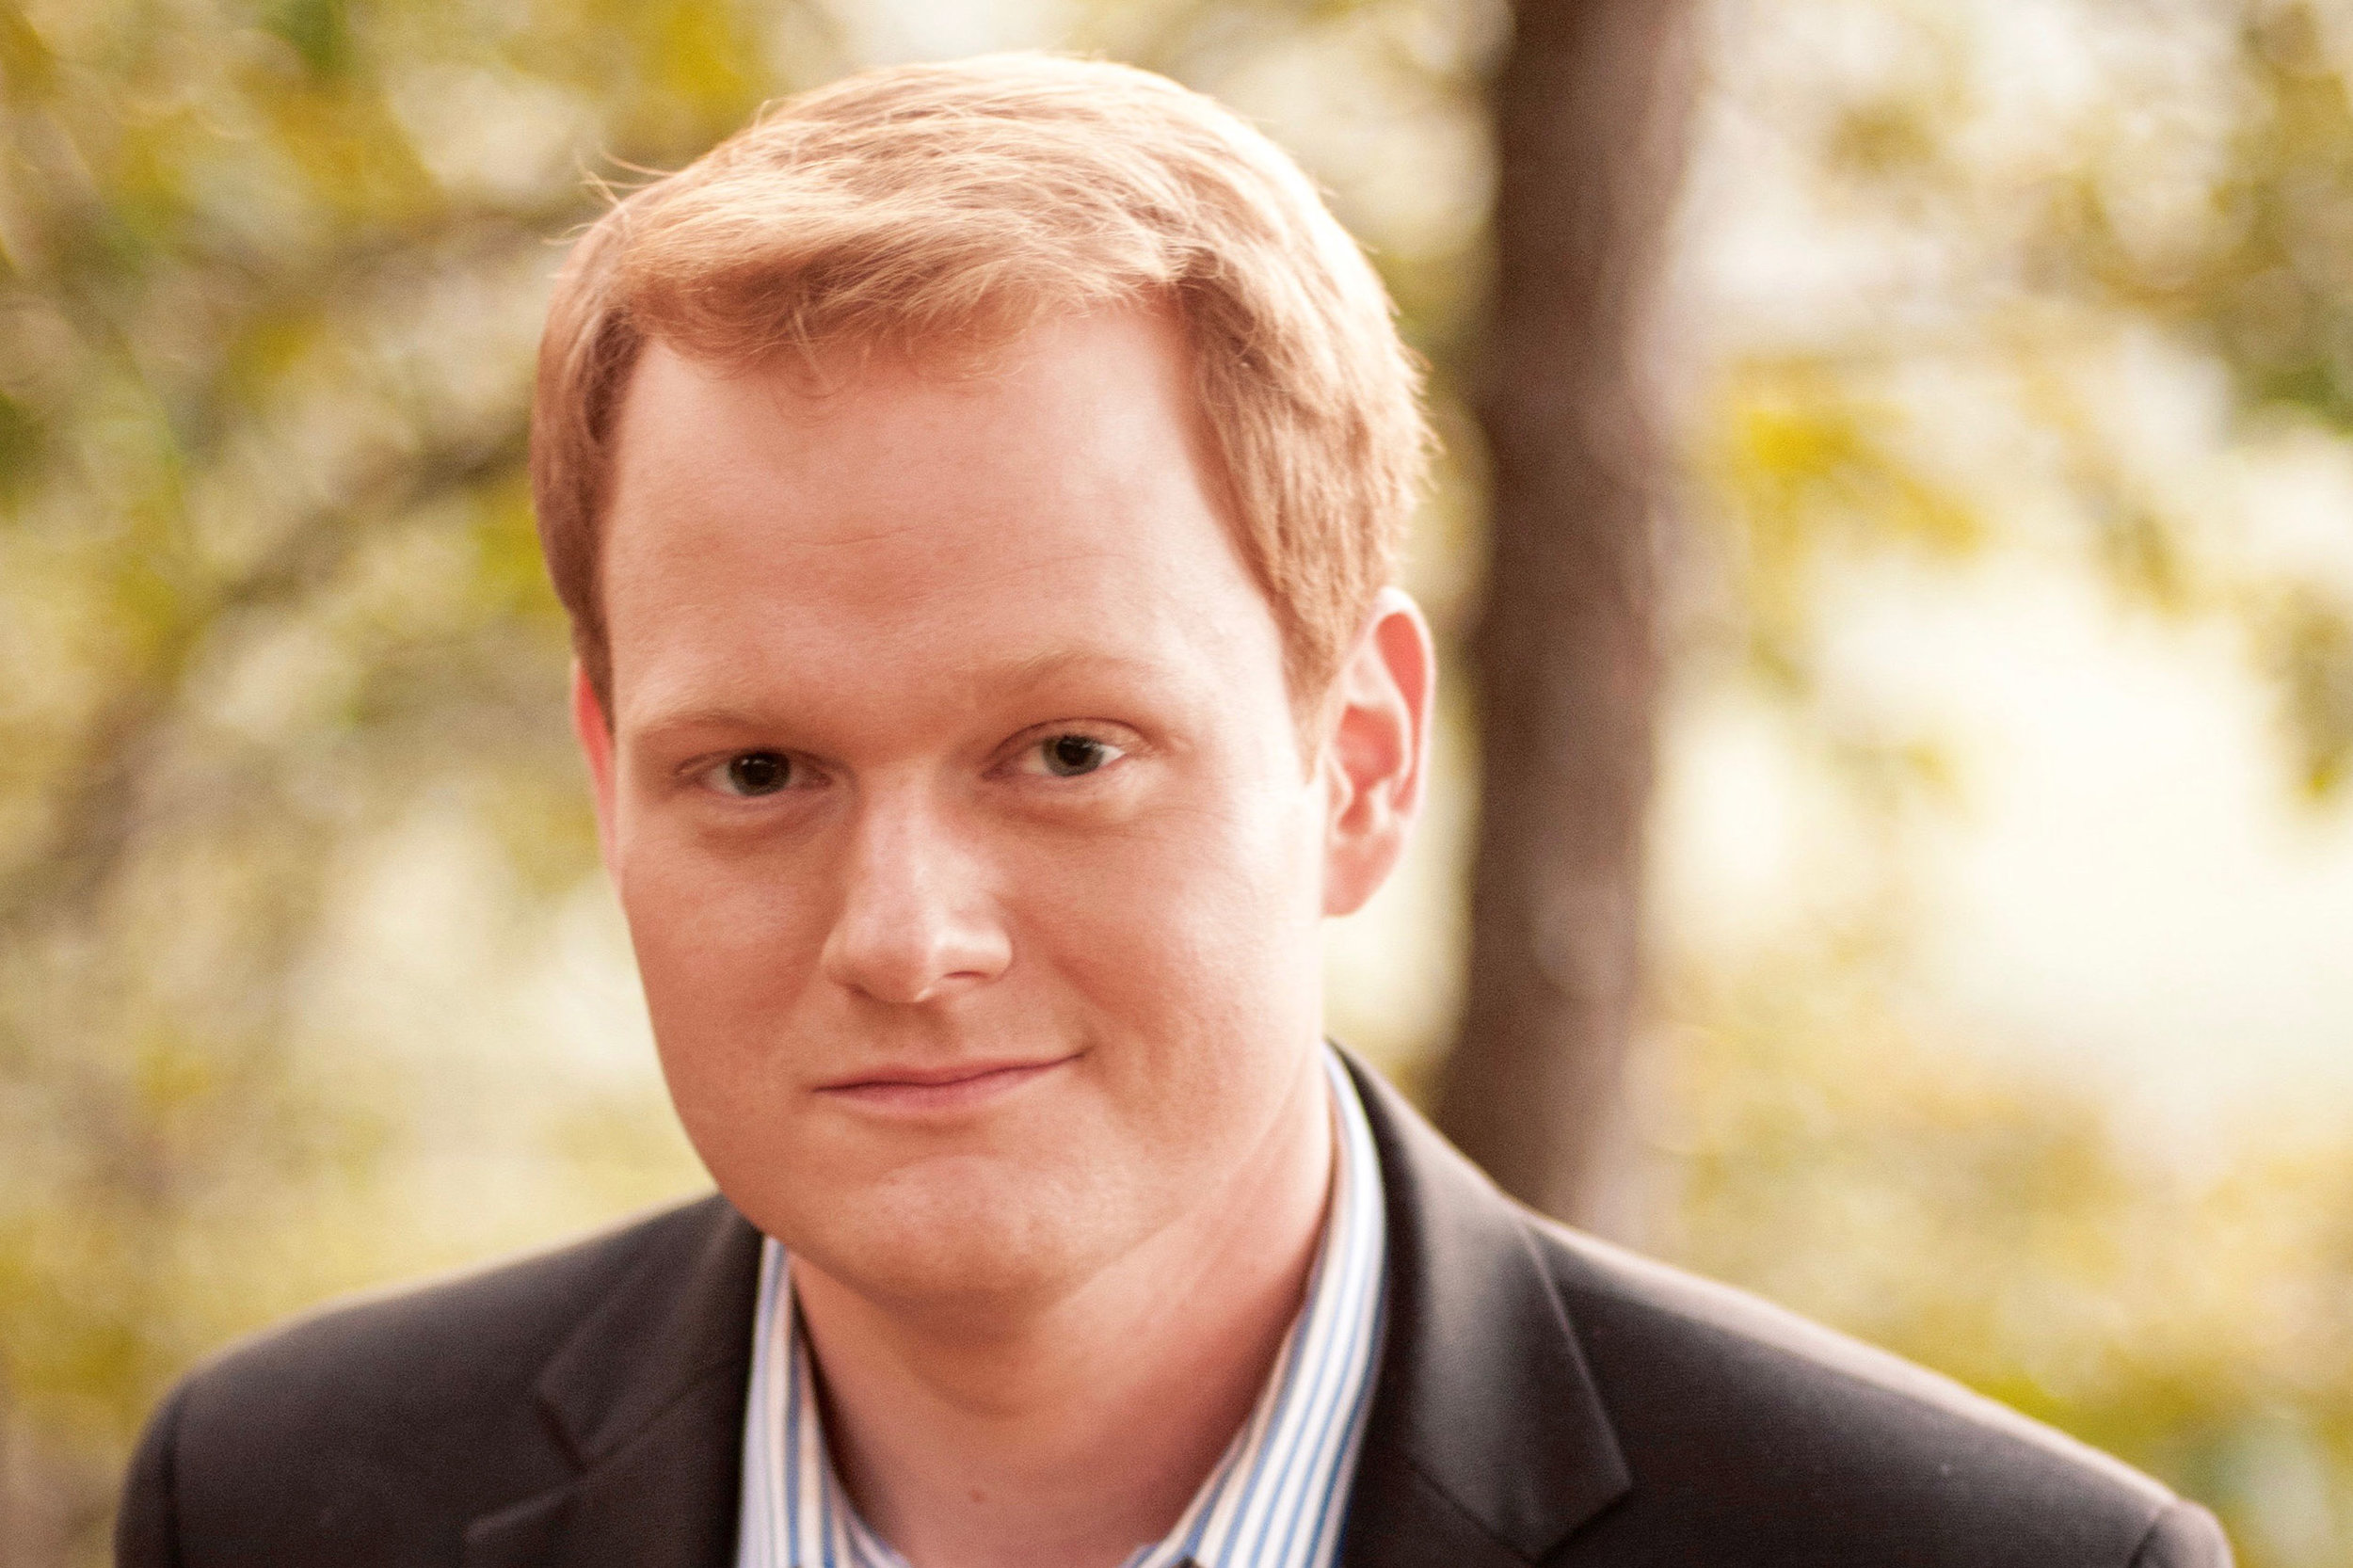 Chris Hurst - Meet the candidate: Chris Hurst